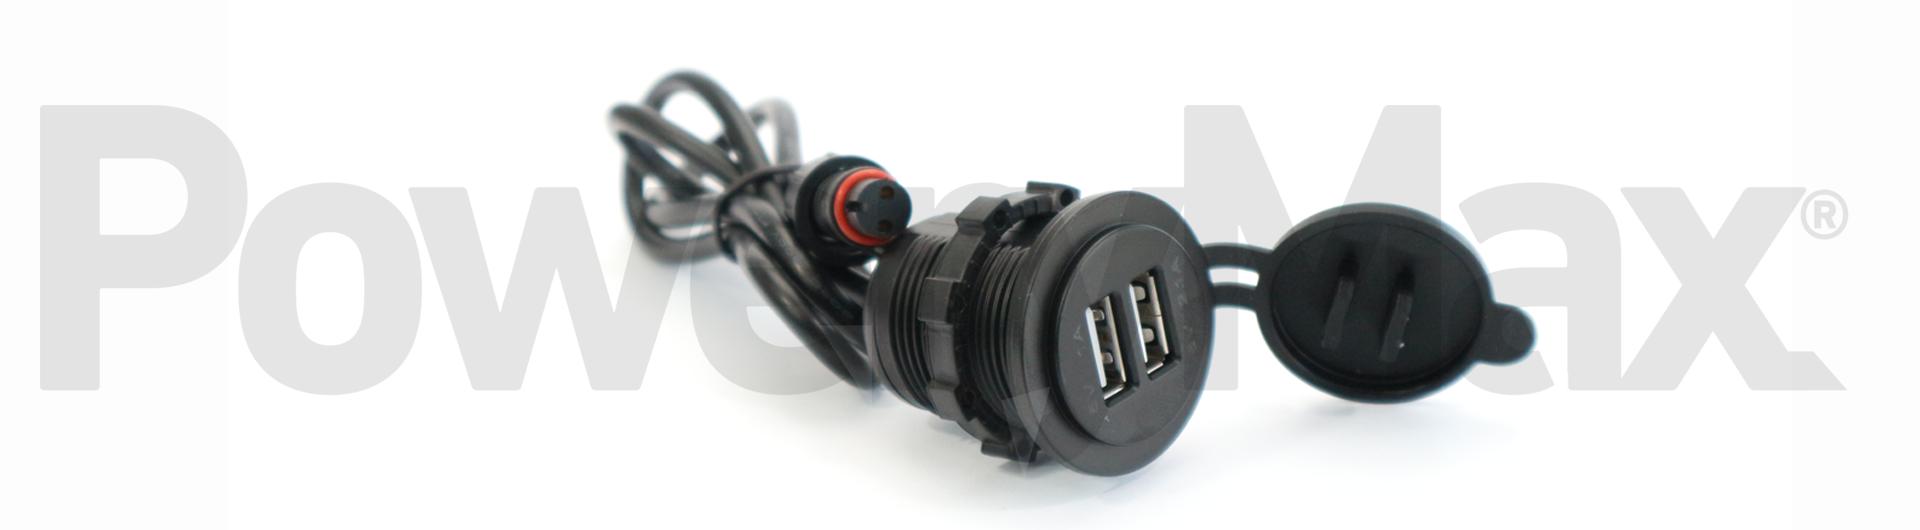 USB PoweryMax